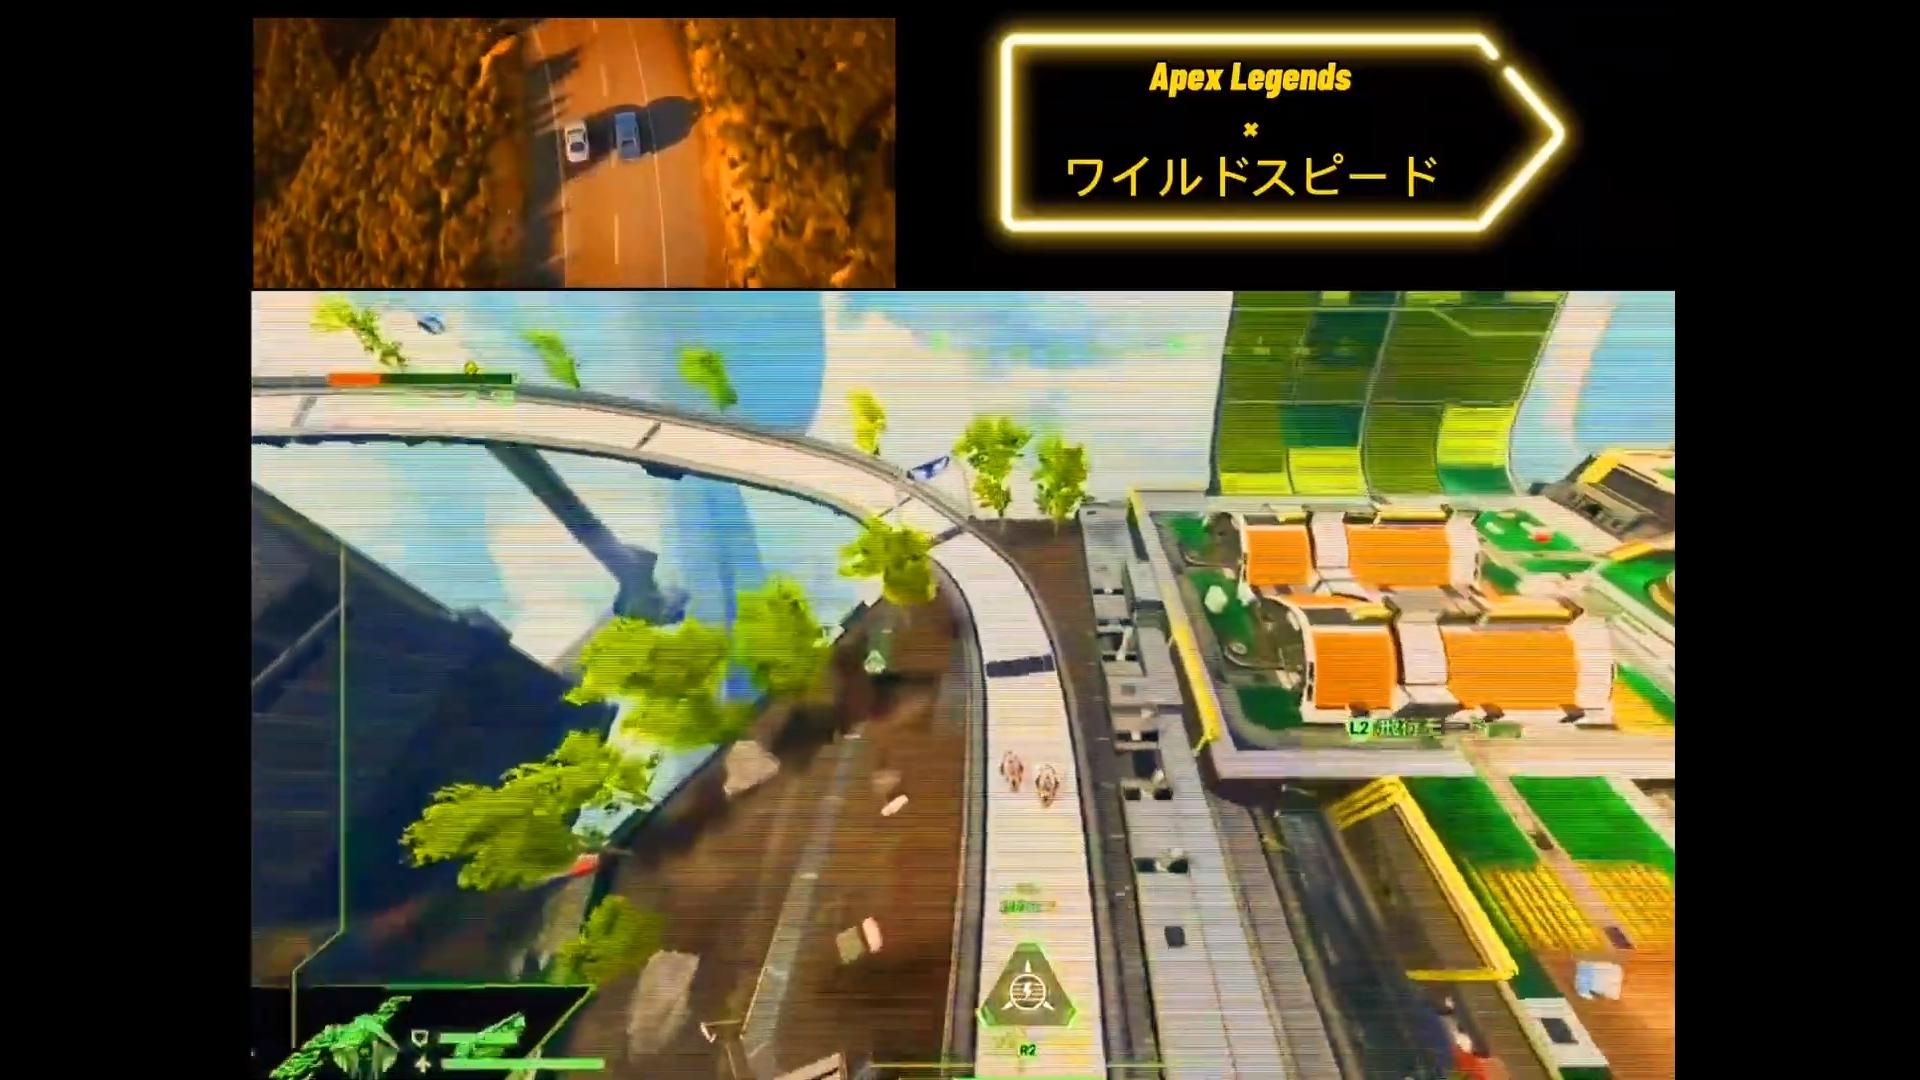 【APEX】映画「ワイルド・スピード」の感動シーンをトライデントで再現するファン現る!?